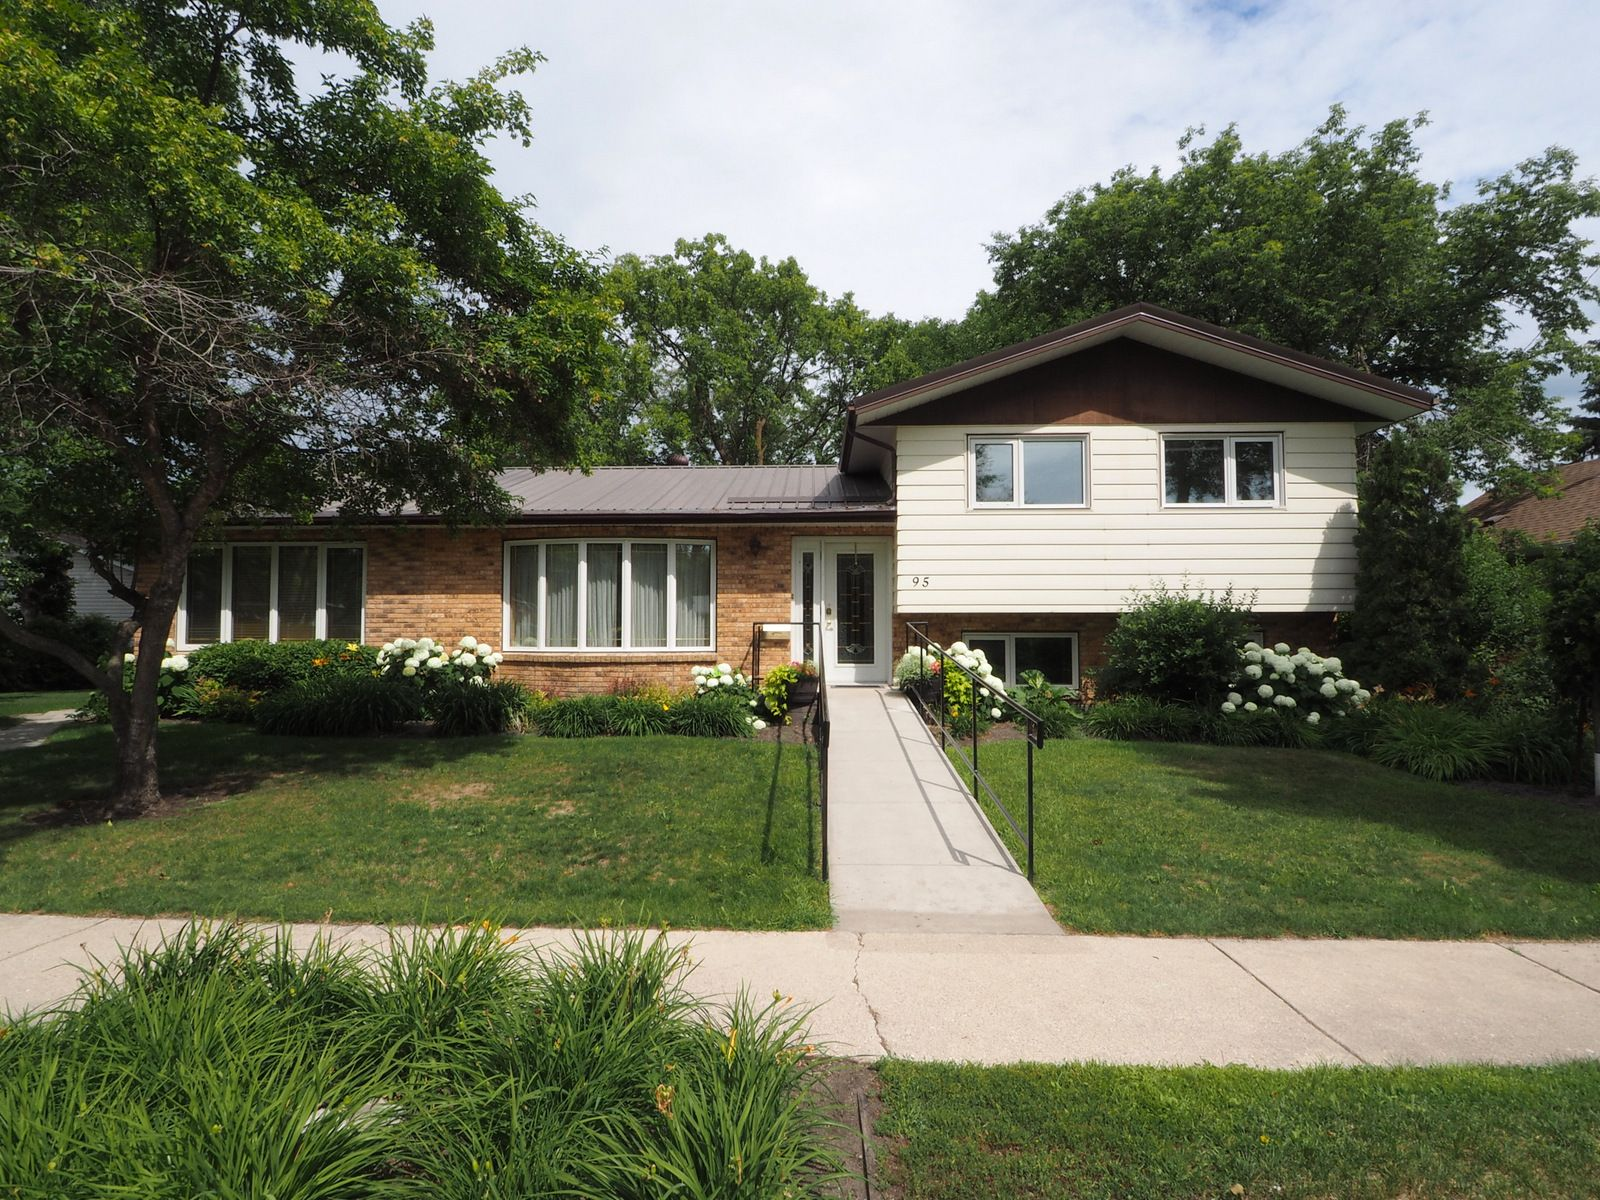 Main Photo: 95 Hampton Street W in Macgregor: House for sale : MLS®# 202017345